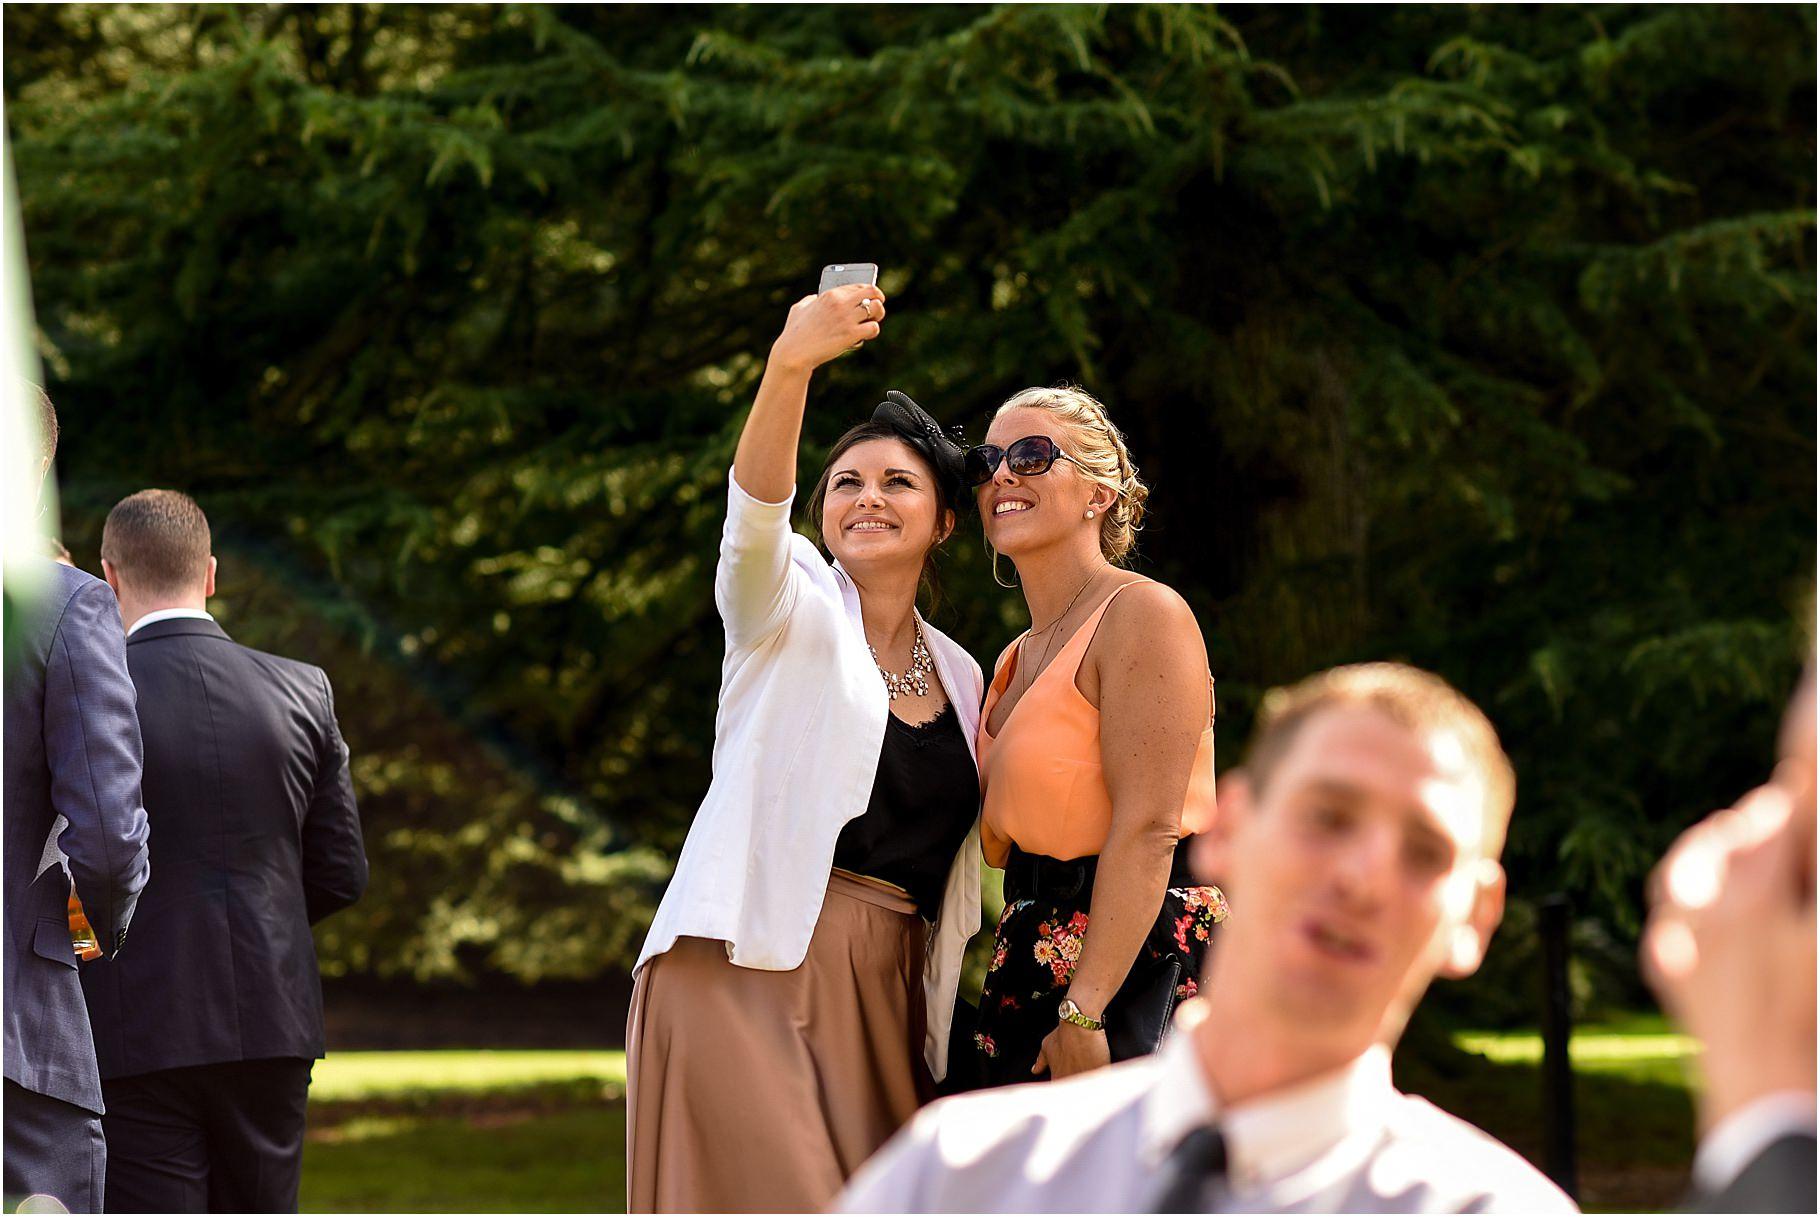 bartle-hall-wedding-photography-052.jpg